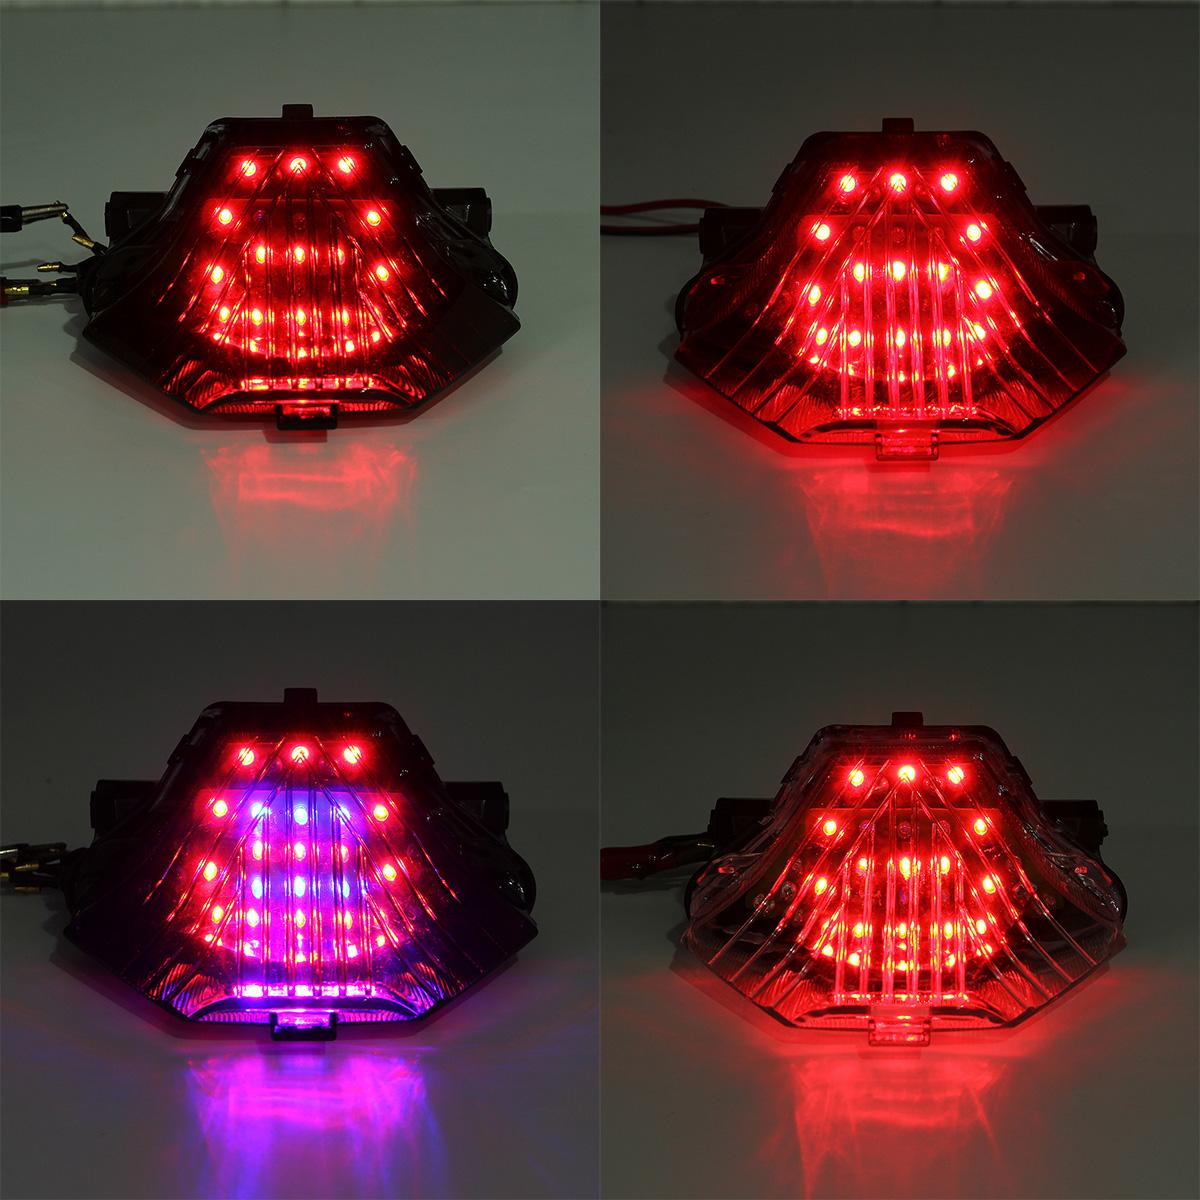 Tail Light Led Integrated Turn Signals Blinker For Yamaha